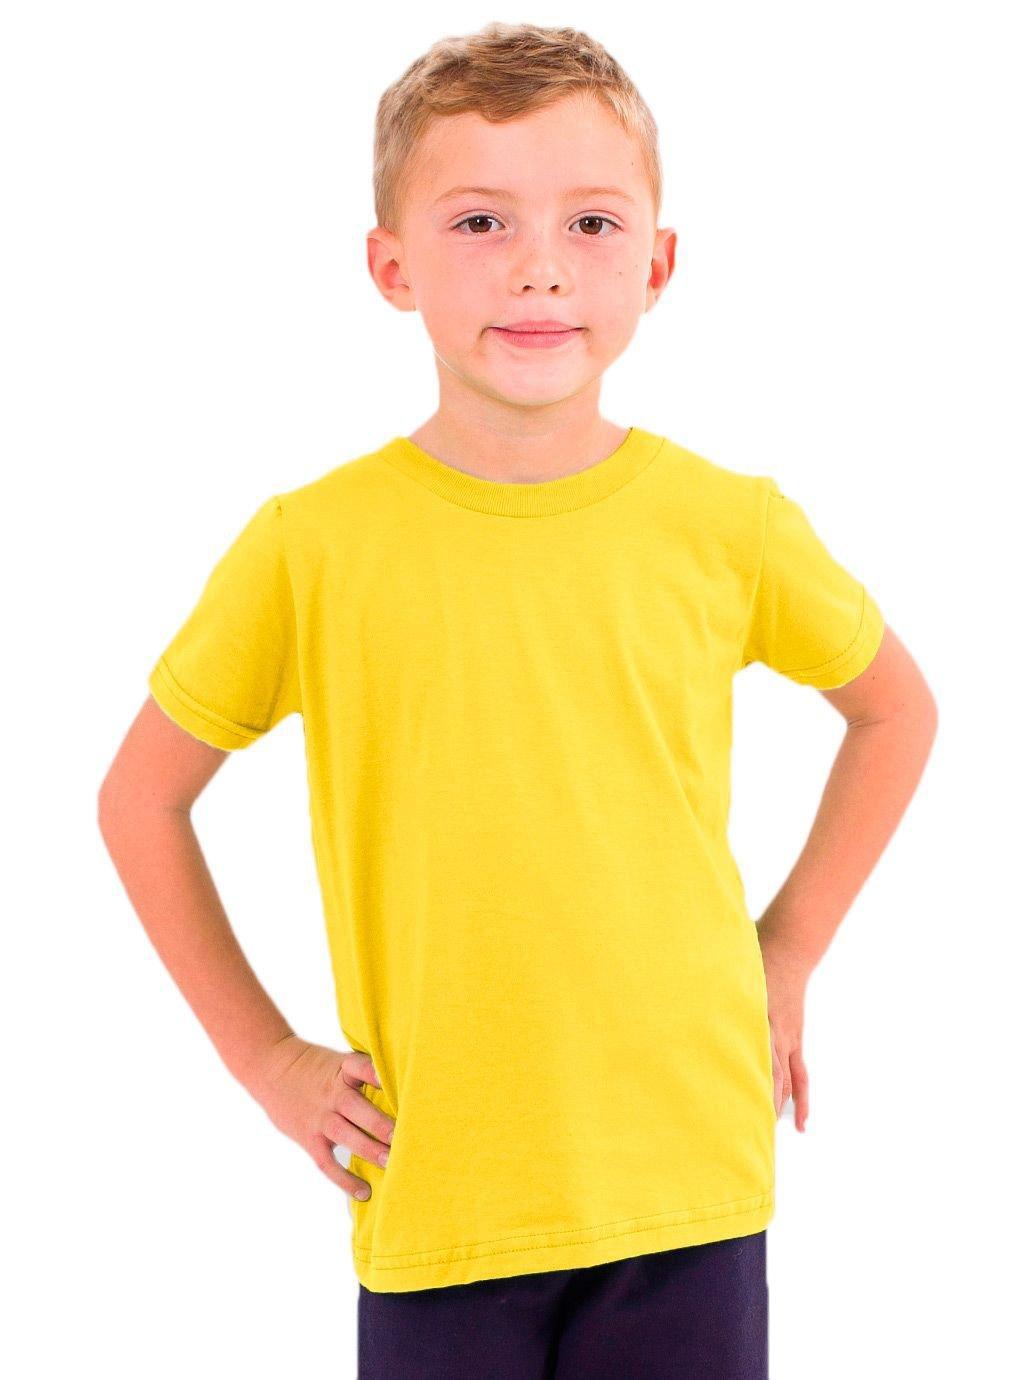 American Apparel 2105 - Toddler's Fine Jersey Short-Sleeve T-Shirt